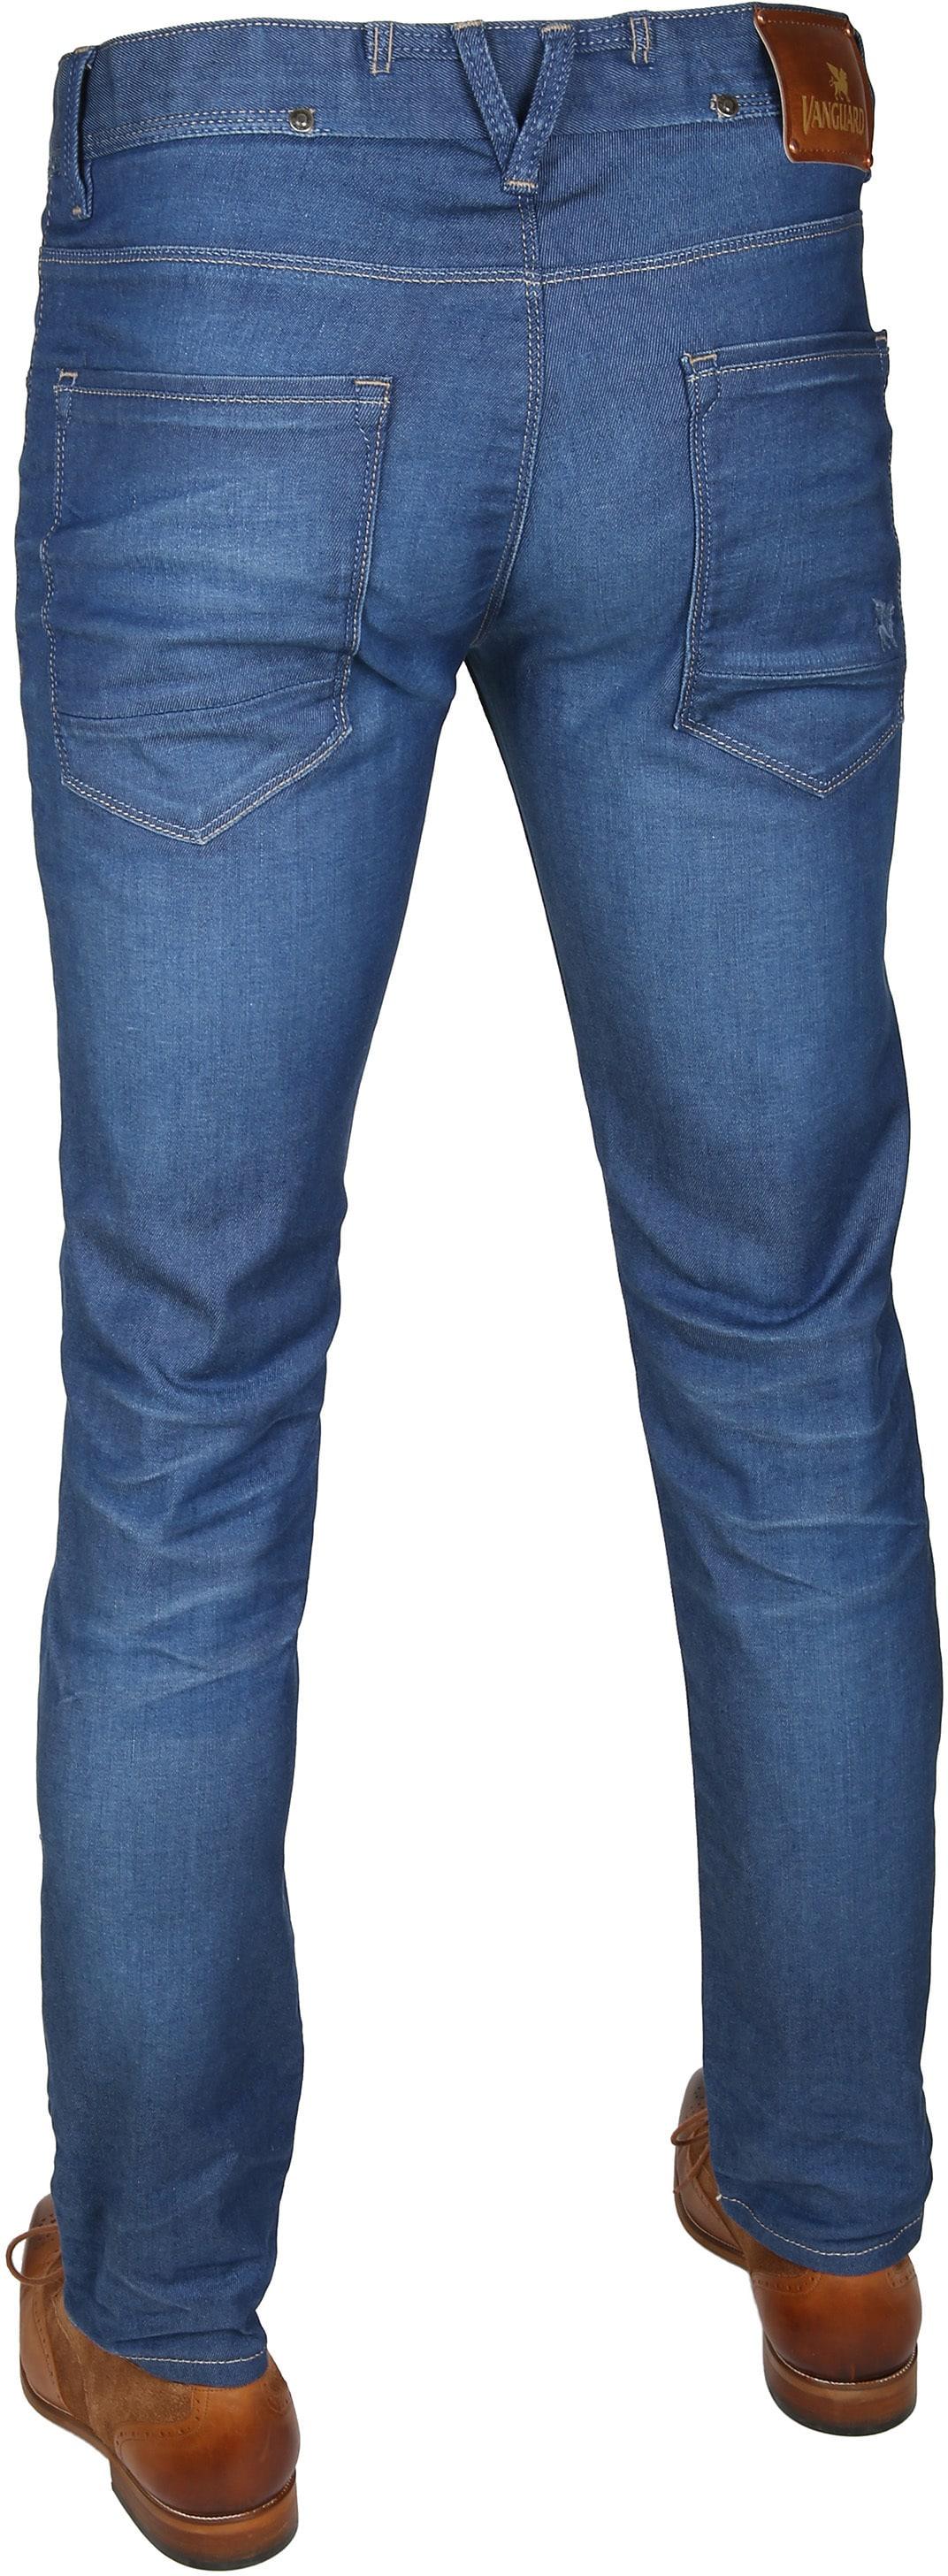 Vanguard V7 Rider Jeans foto 3